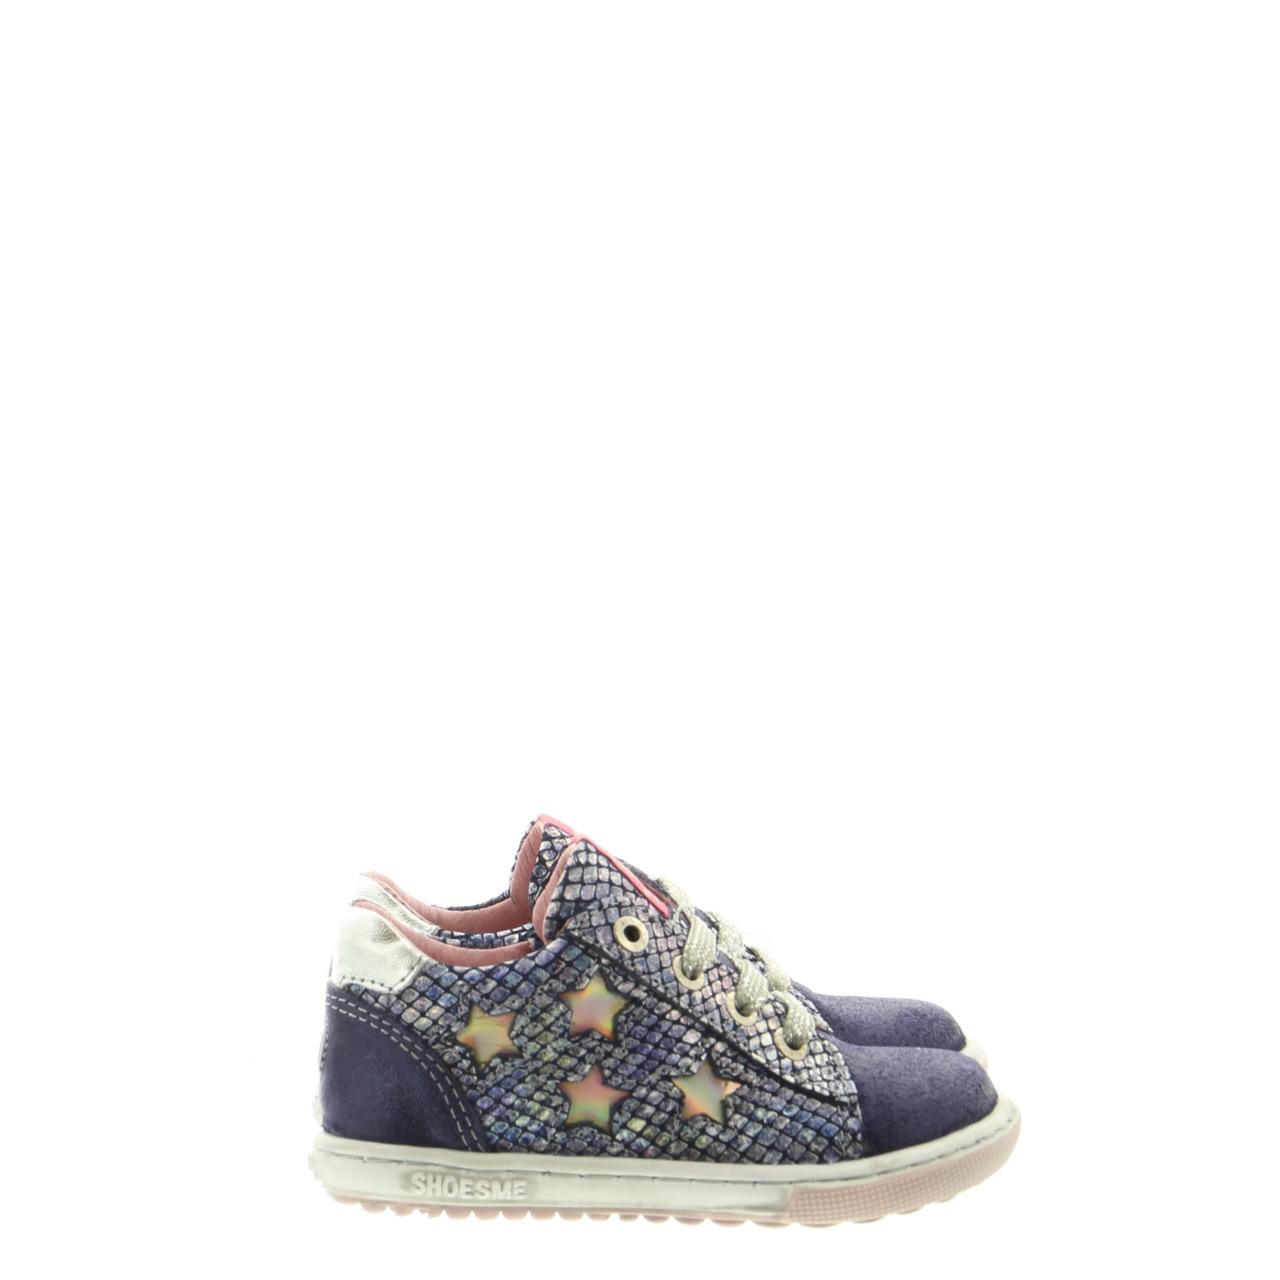 ShoesMe EF8S032-E Marino